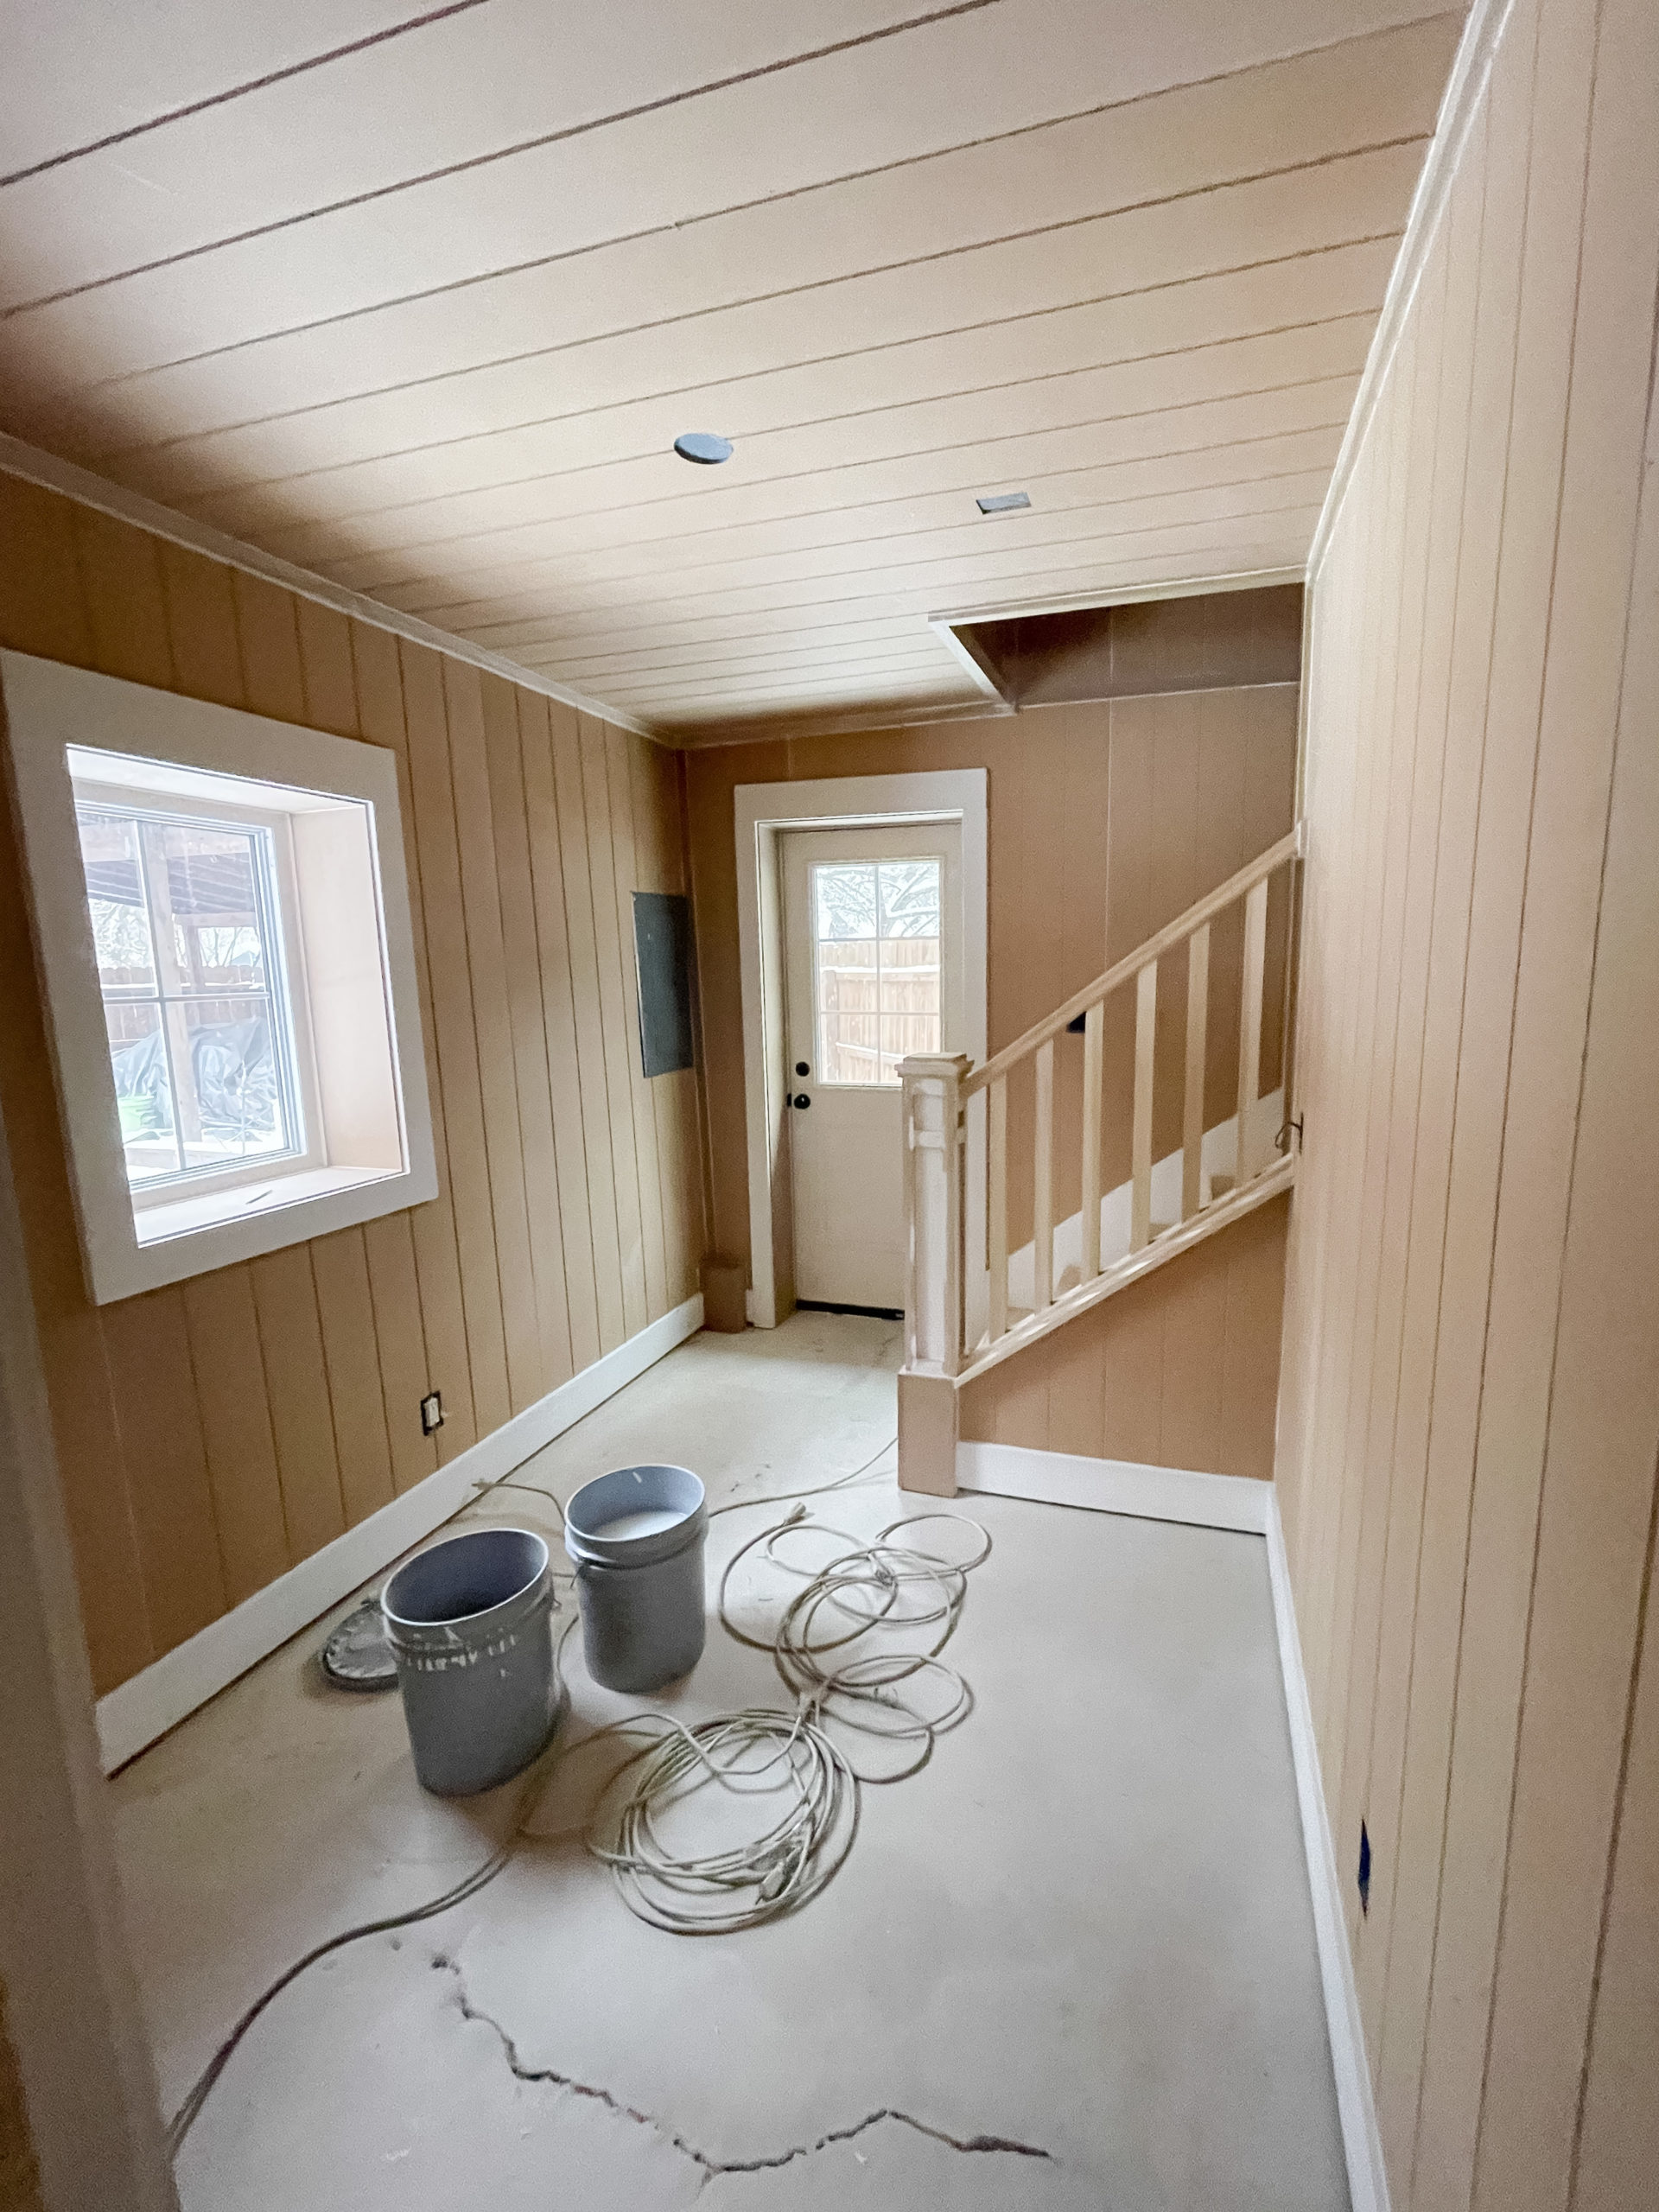 Pool house trim work paneled walls